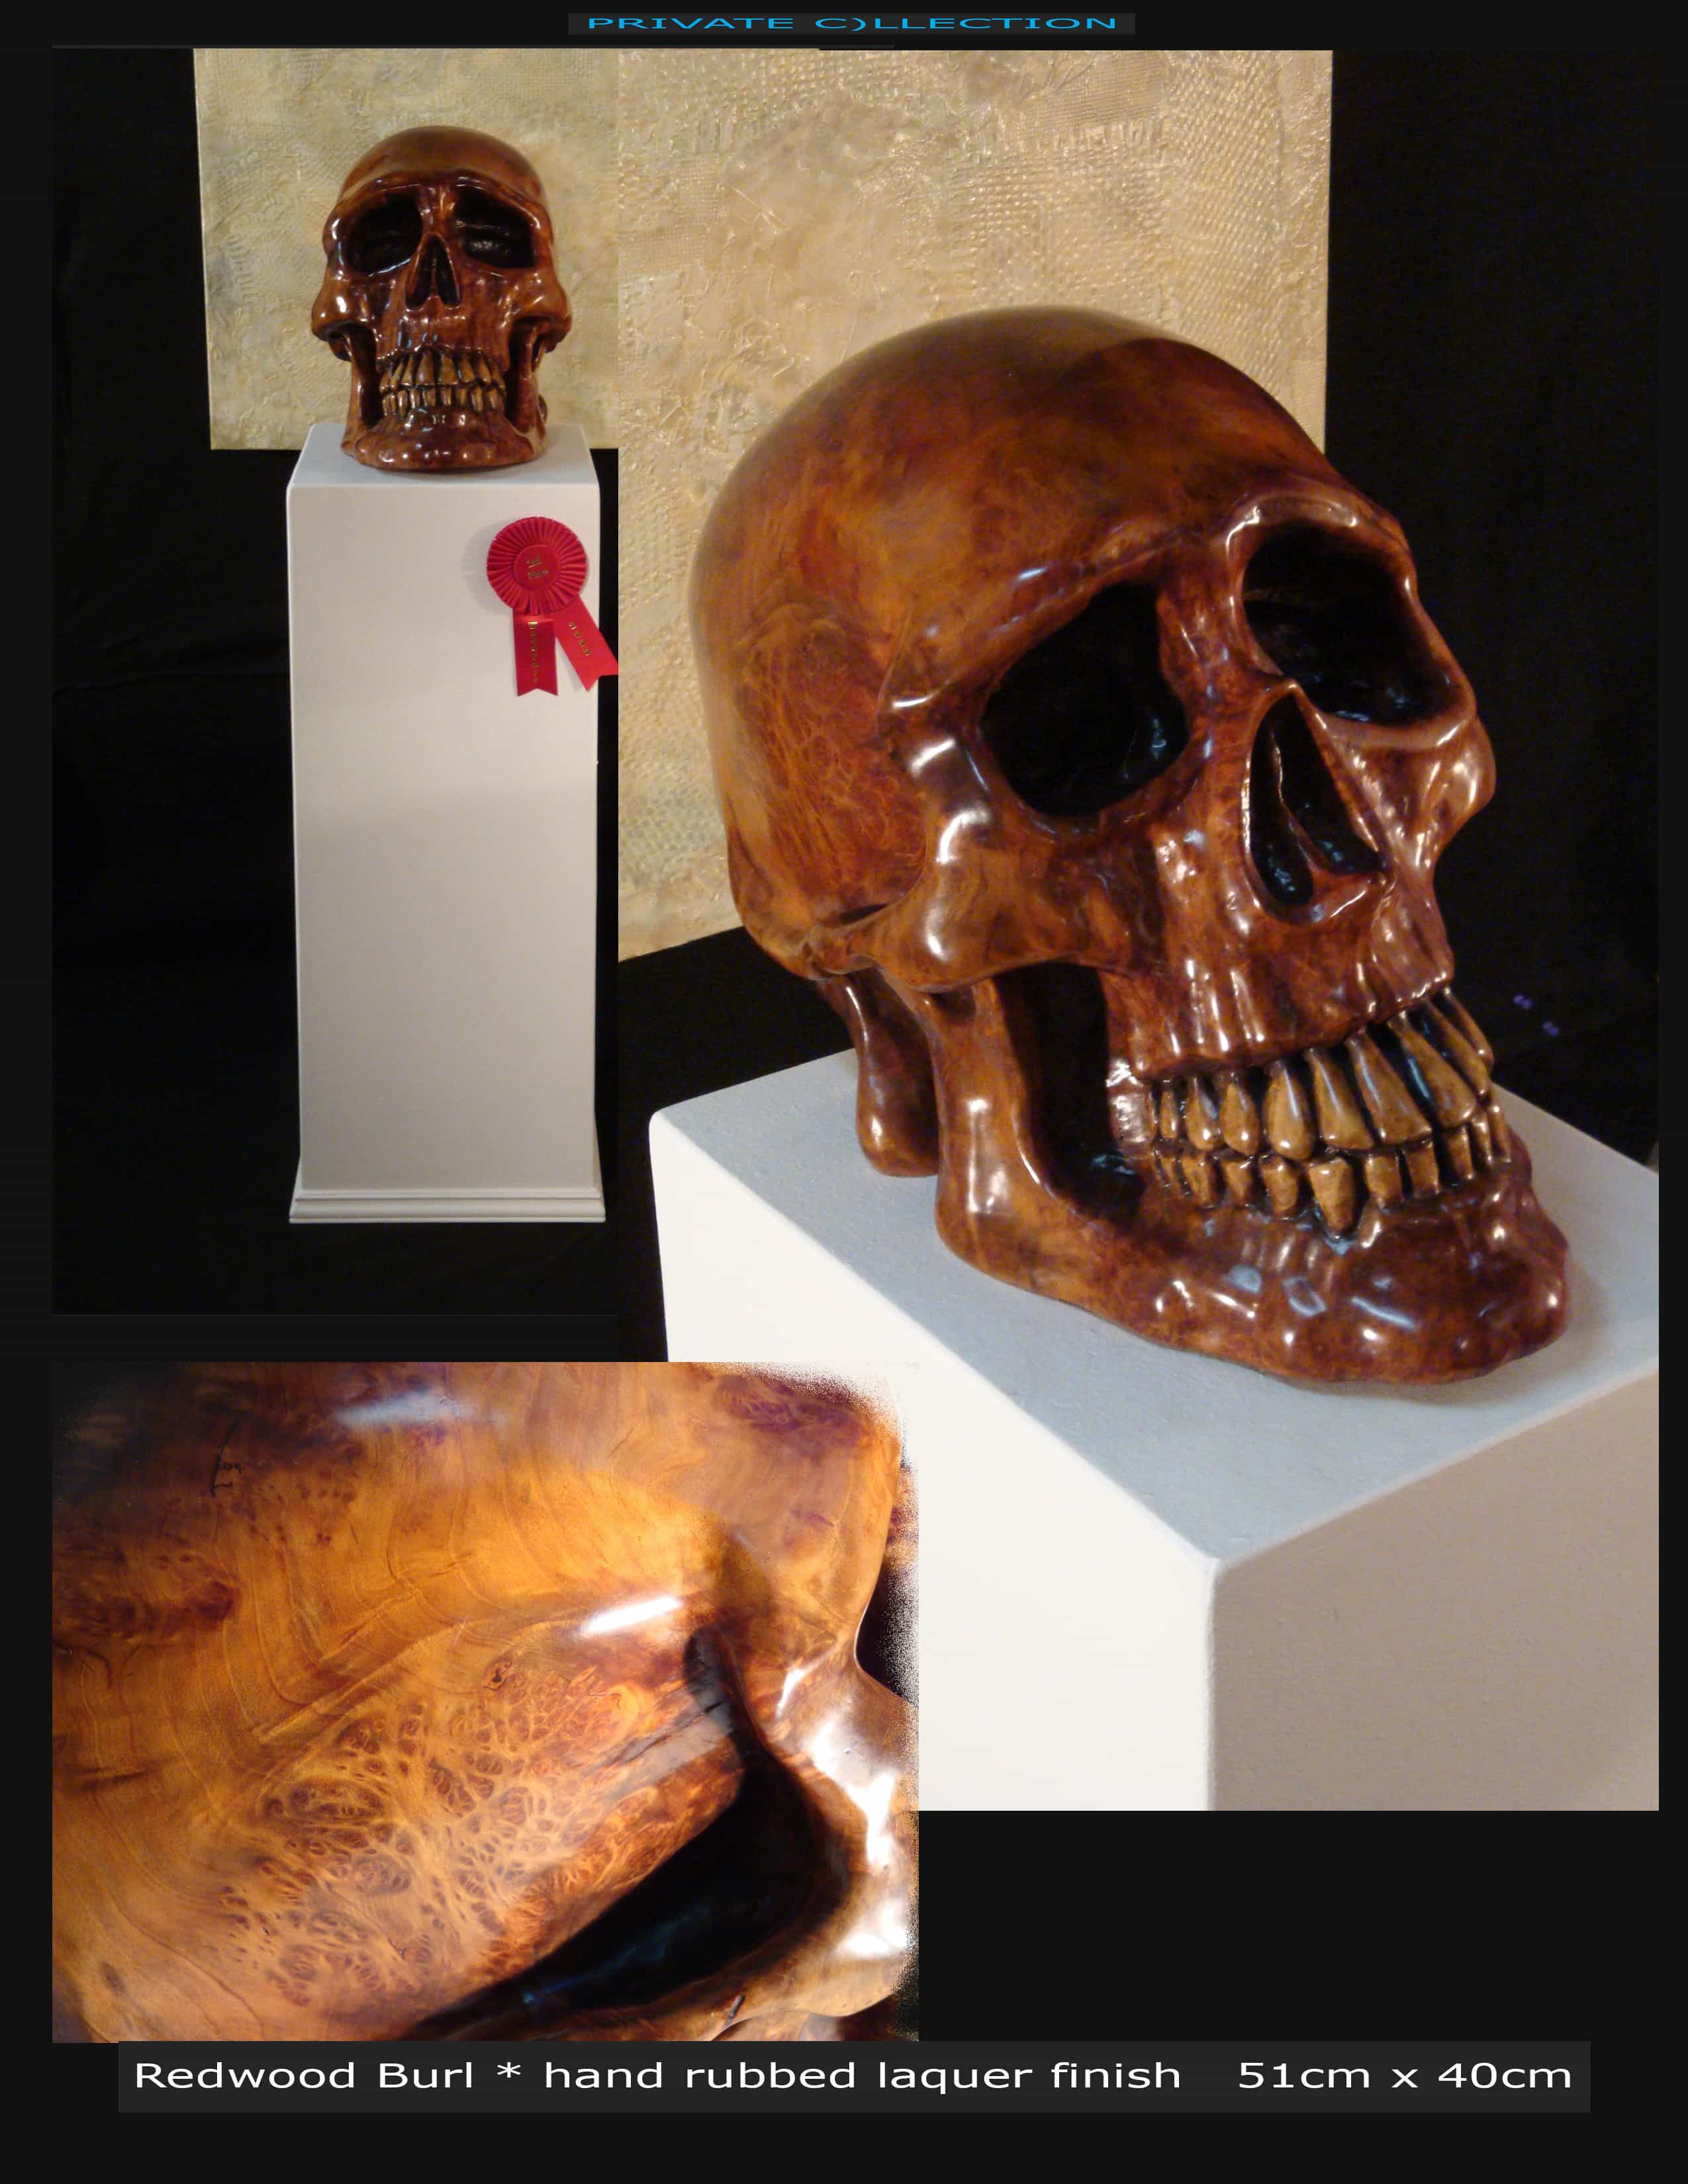 Redwood Burl Skull Image